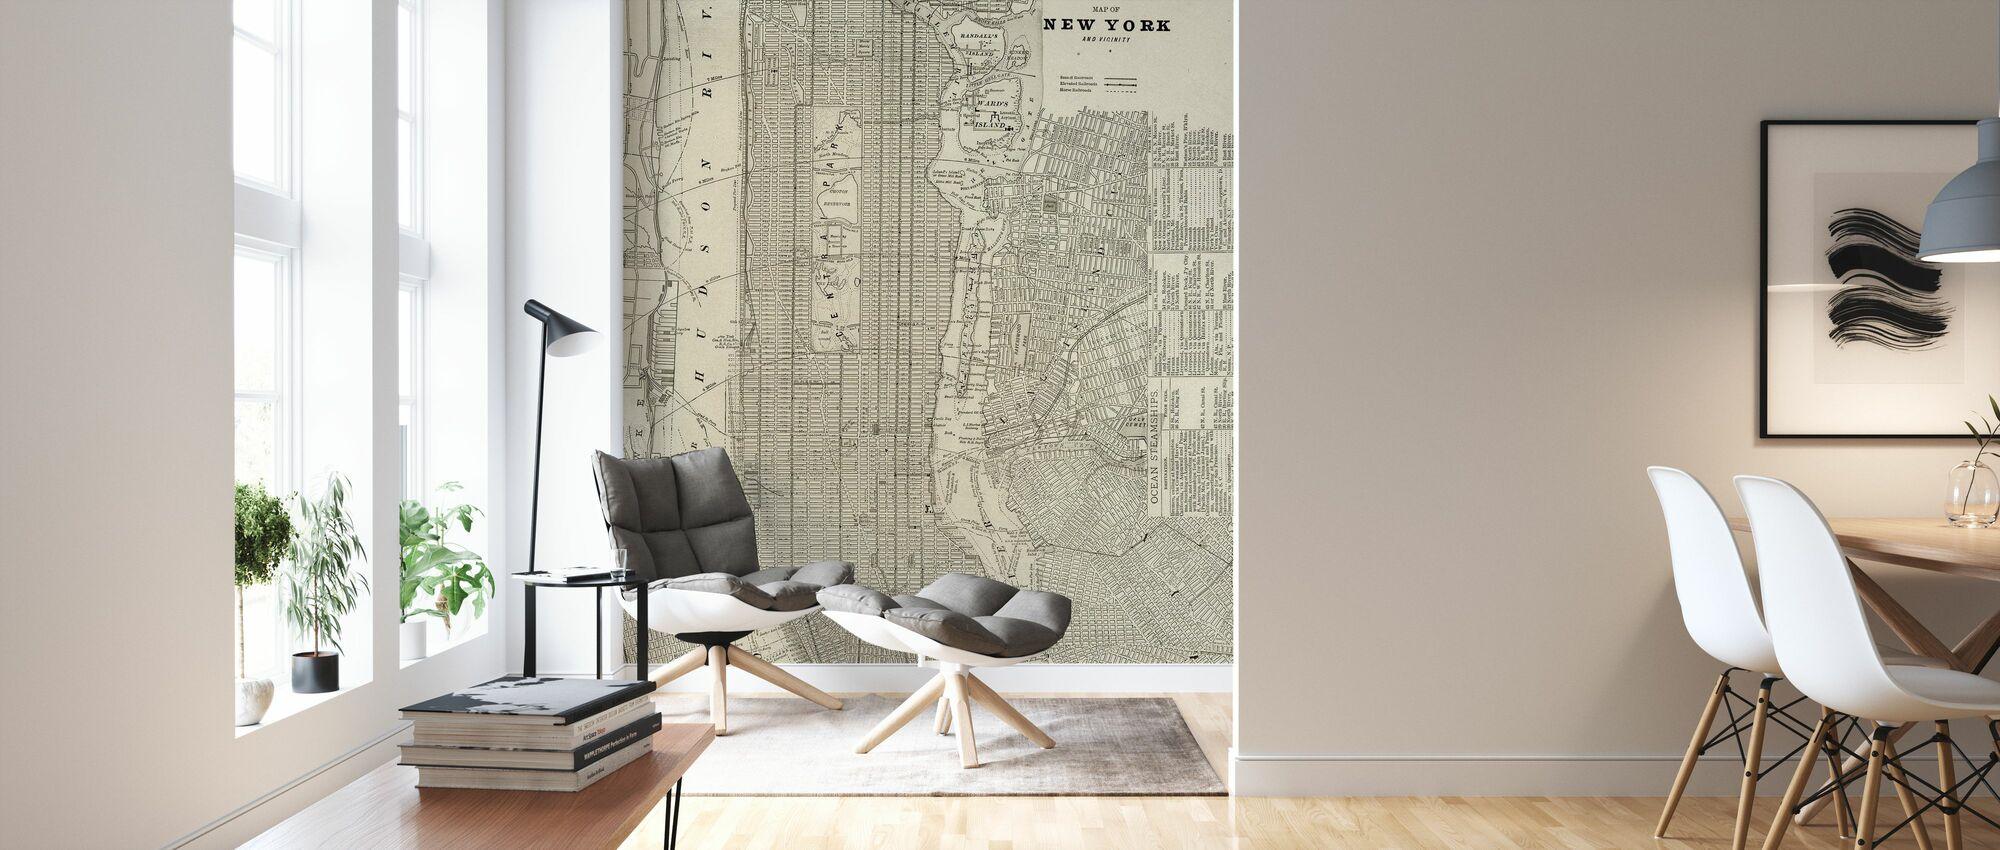 Newsprint NYC Map - Wallpaper - Living Room